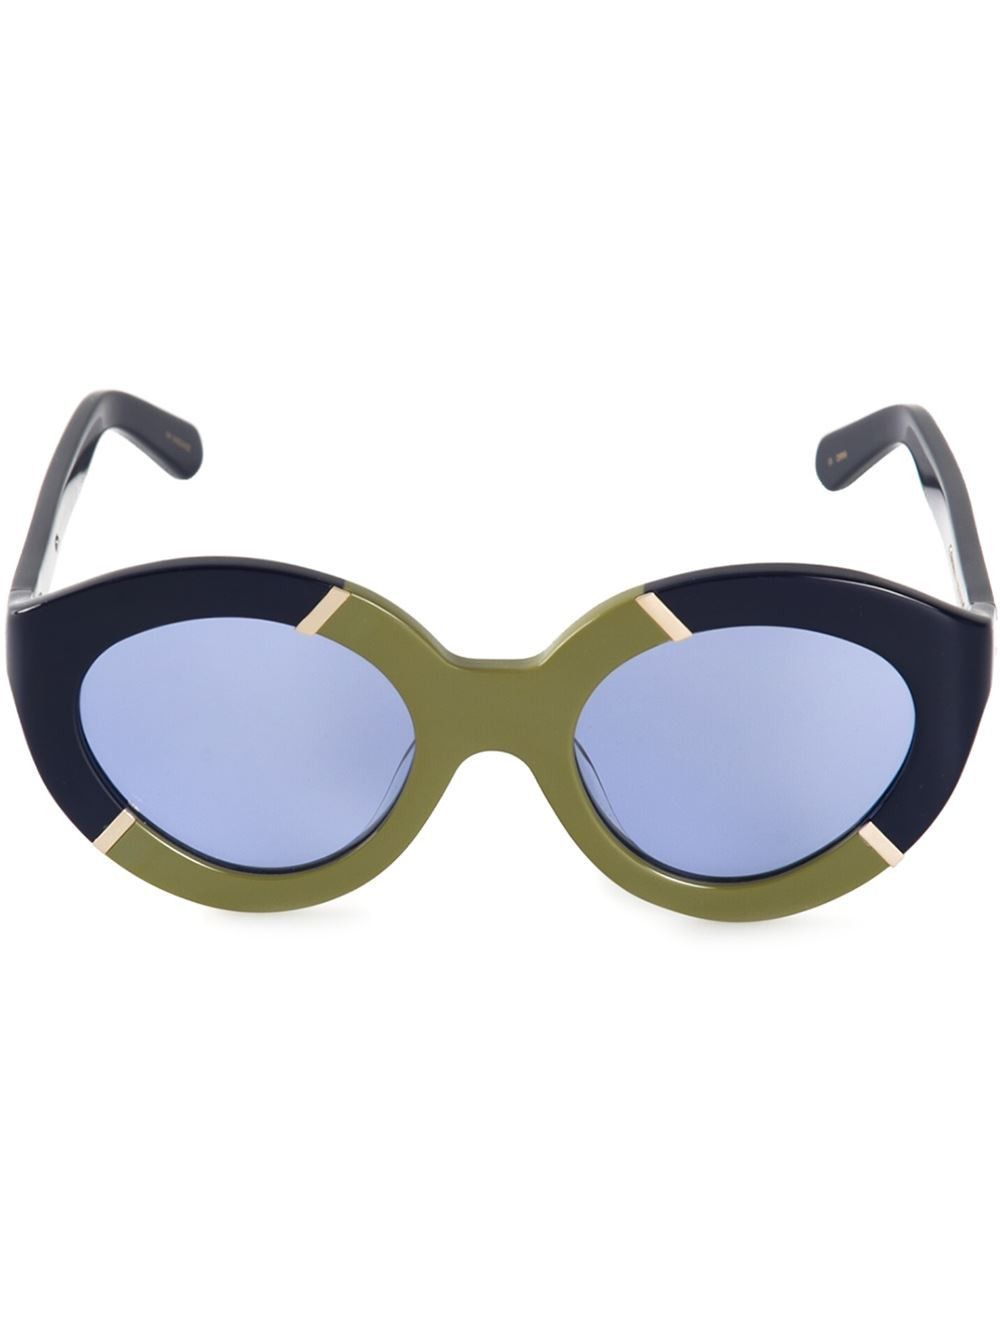 Karen Walker 'Flowerpatch' Sunglasses